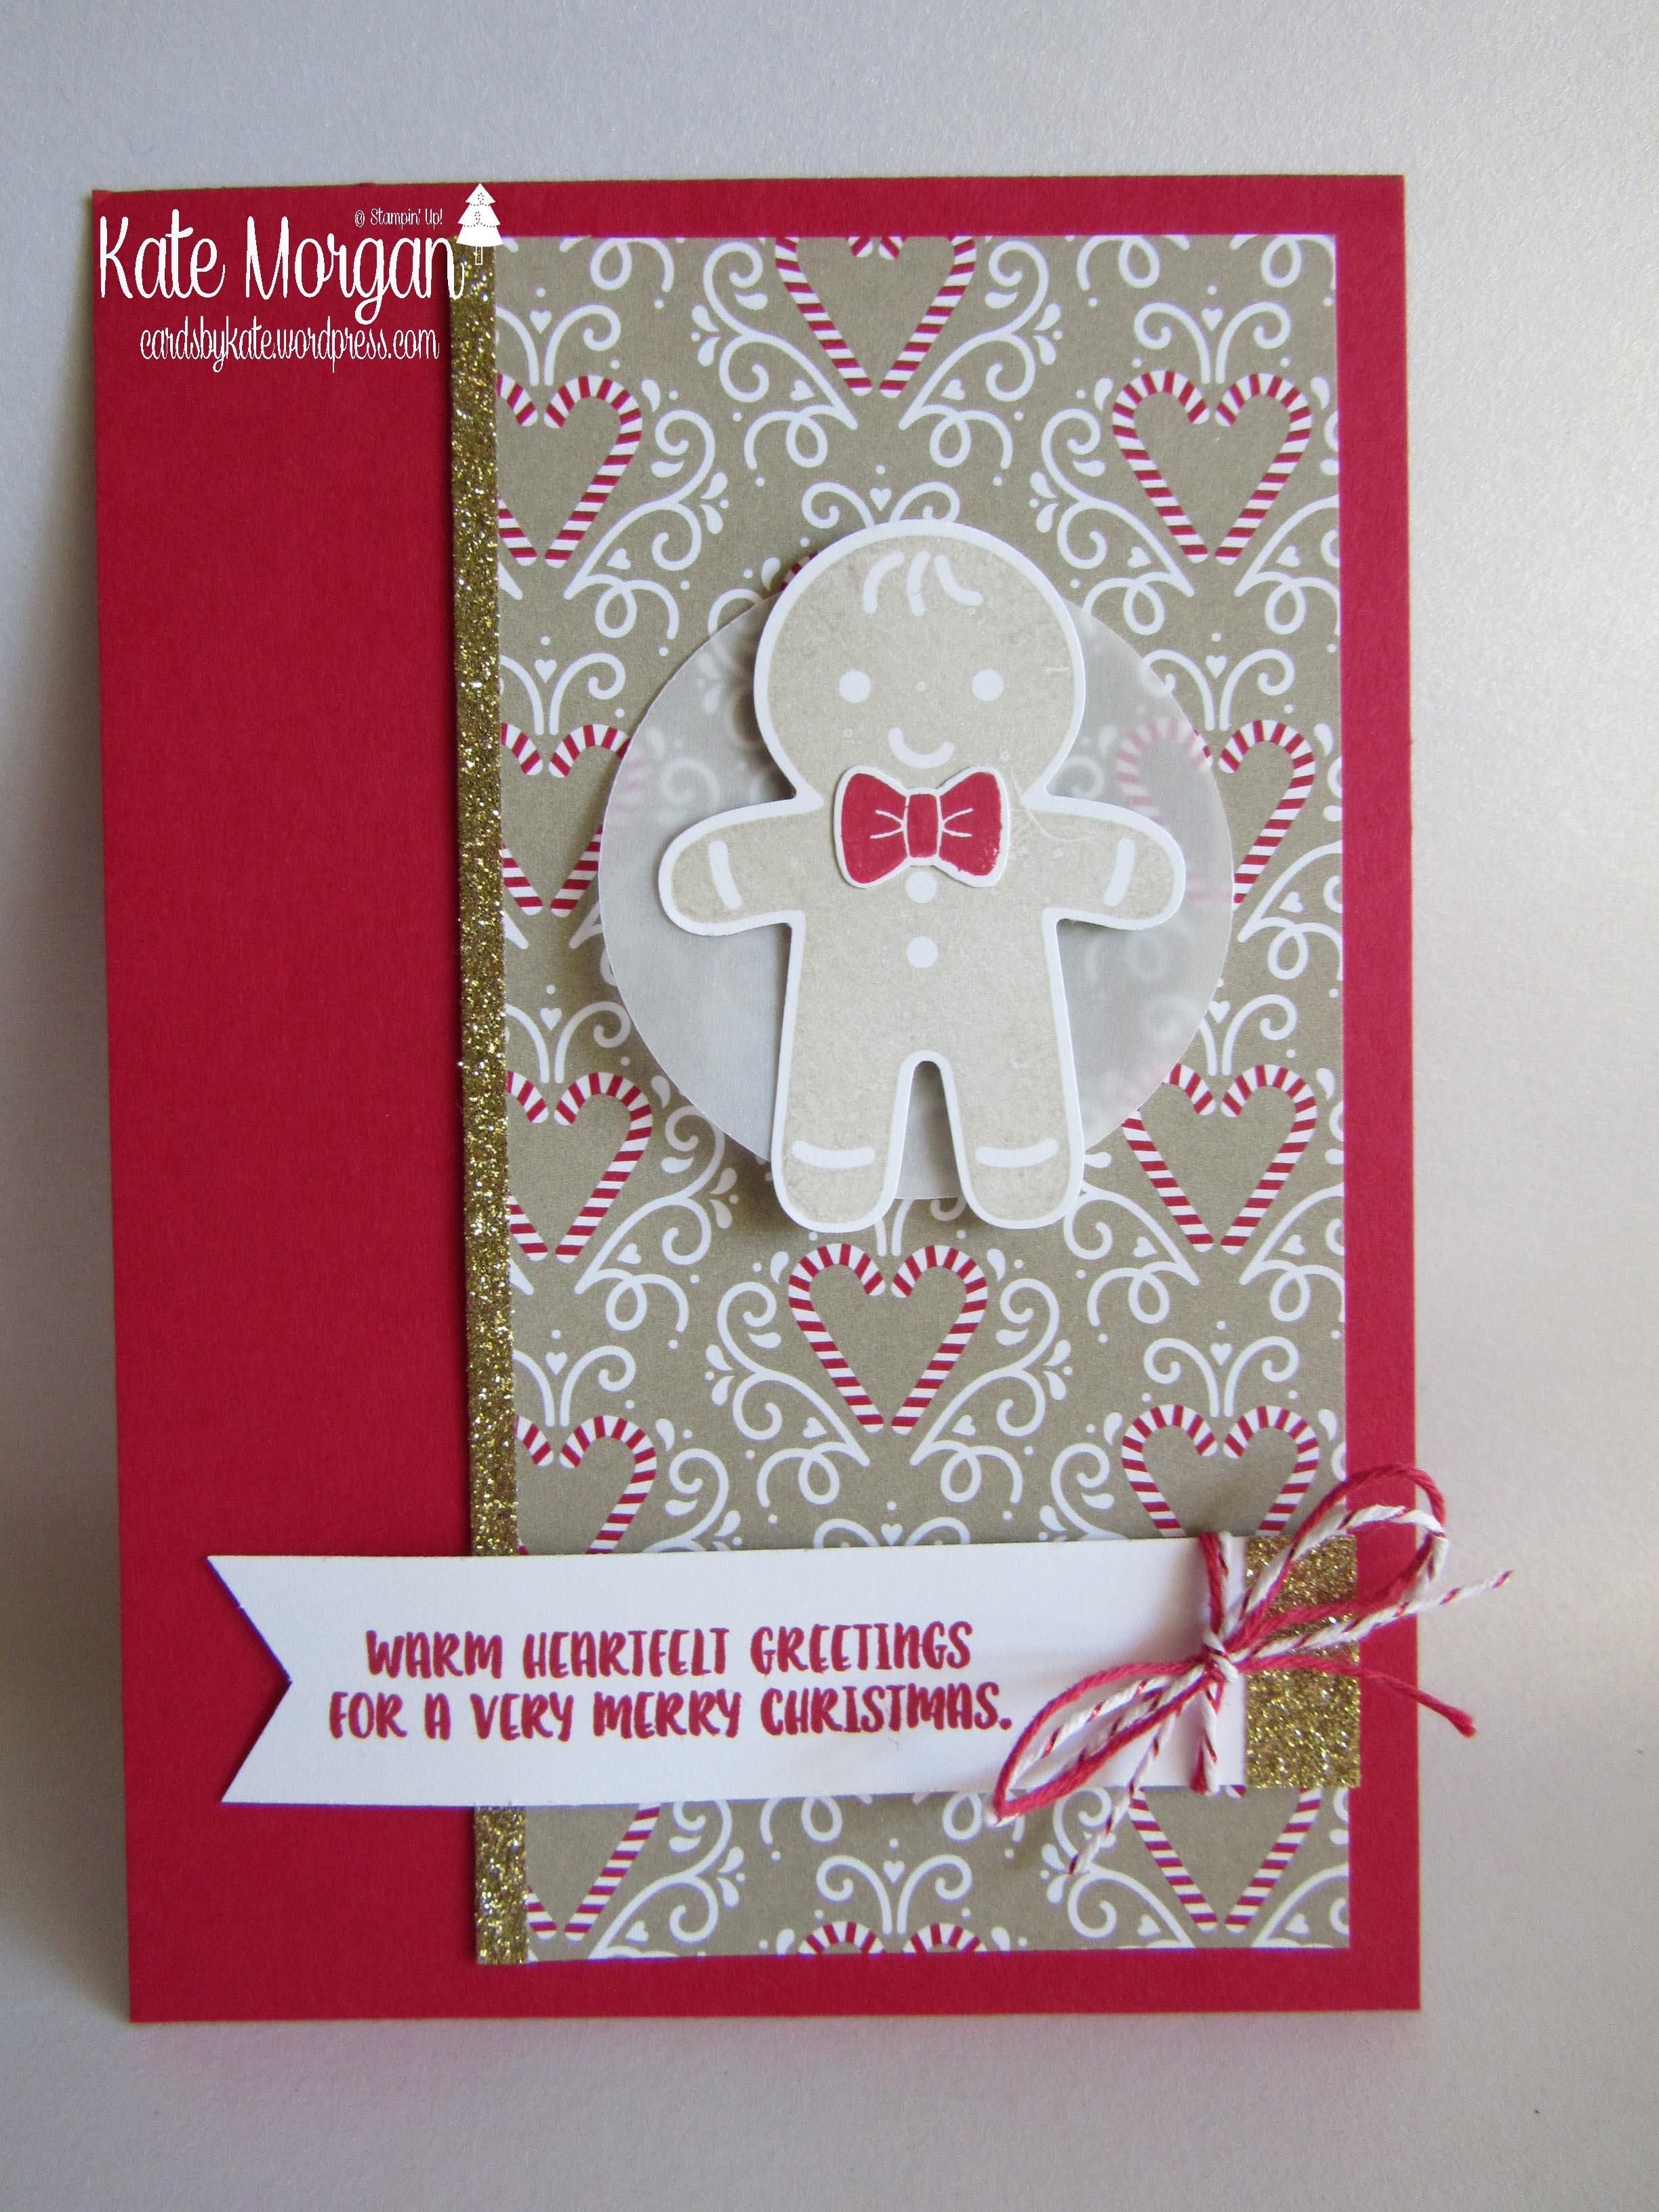 Gingerbread Man Cookie Cutter Bundle Candy Cane Lane Dsp Cards By Kate Handmade Christmas Card Diy Stampinupaustralia Cardsbykatemorgan